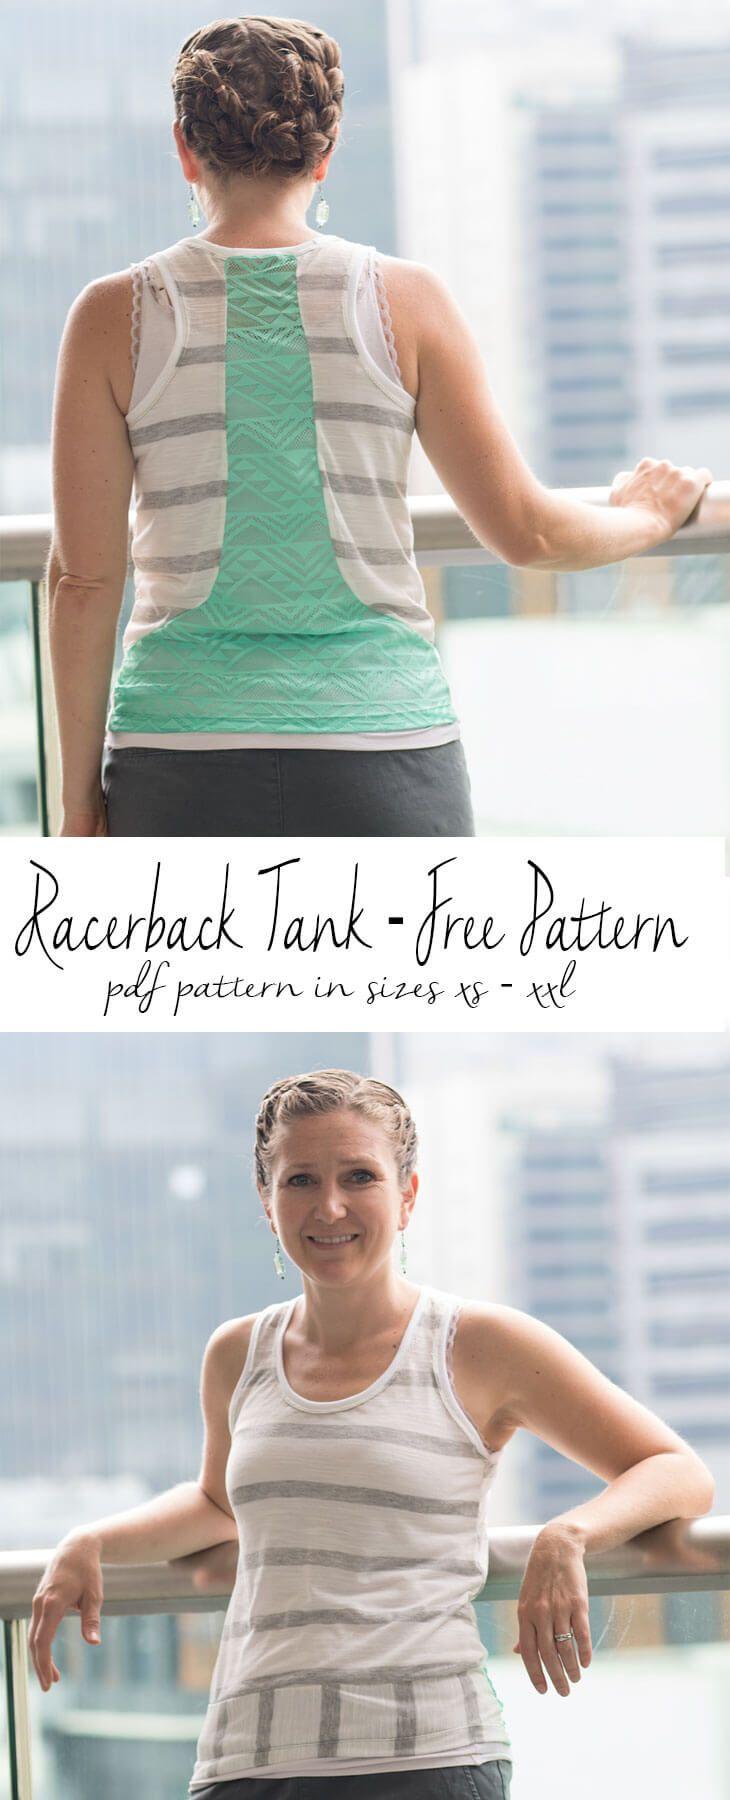 Free tank top sewing pattern a pdf pattern from Life Sew Savory